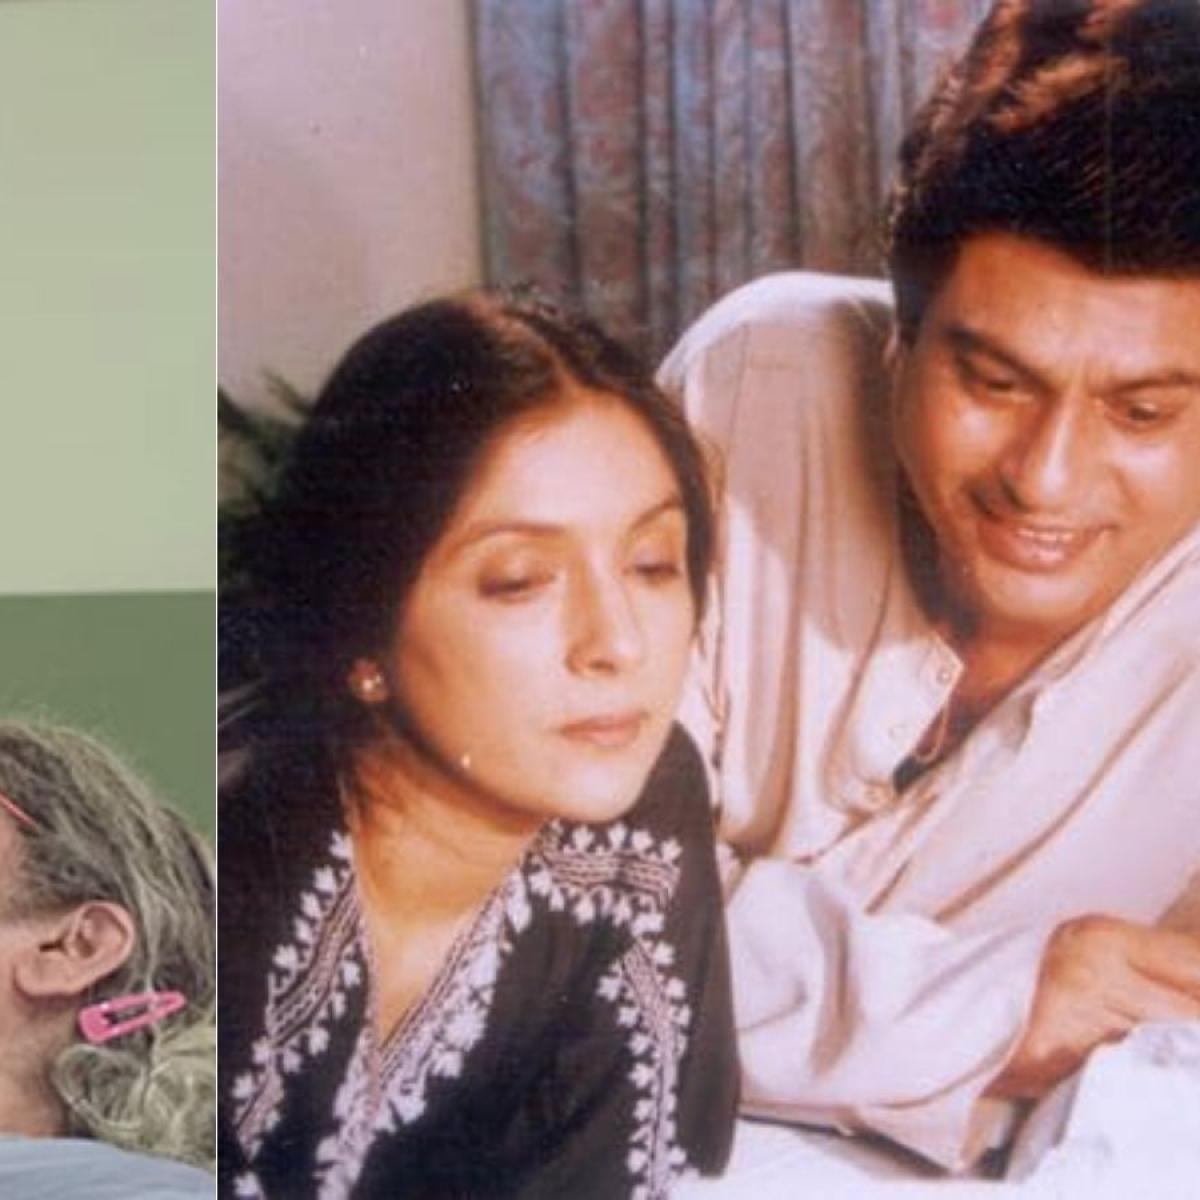 'Acting ka maza': Neena Gupta on essaying Kanwaljit Singh's mom in 'Sardar Ka Grandson' after playing his wife in 'Saans'